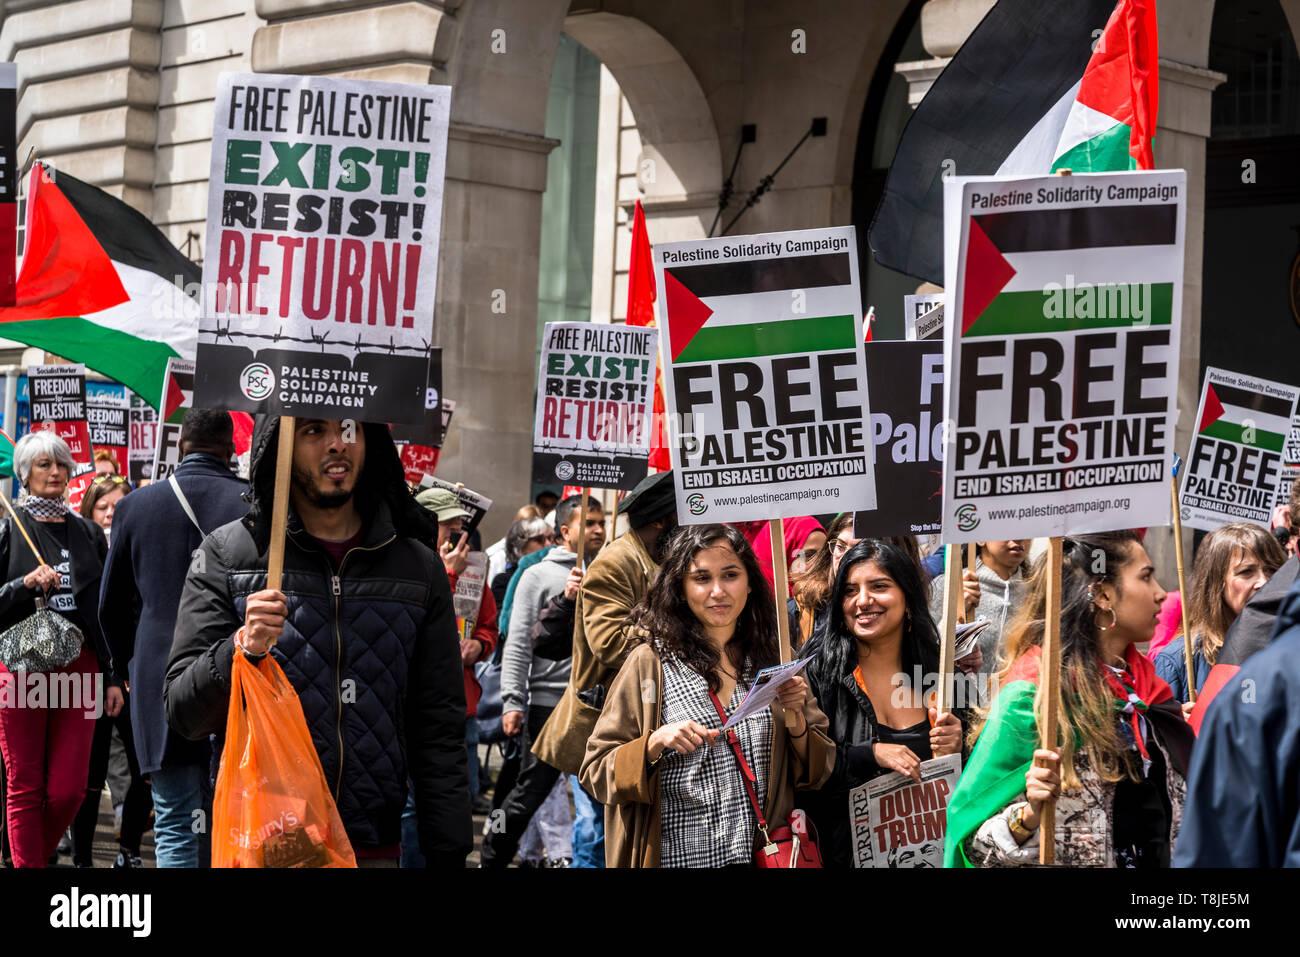 National Demonstration for Palestine, London, UK 11/05/2019 - Stock Image